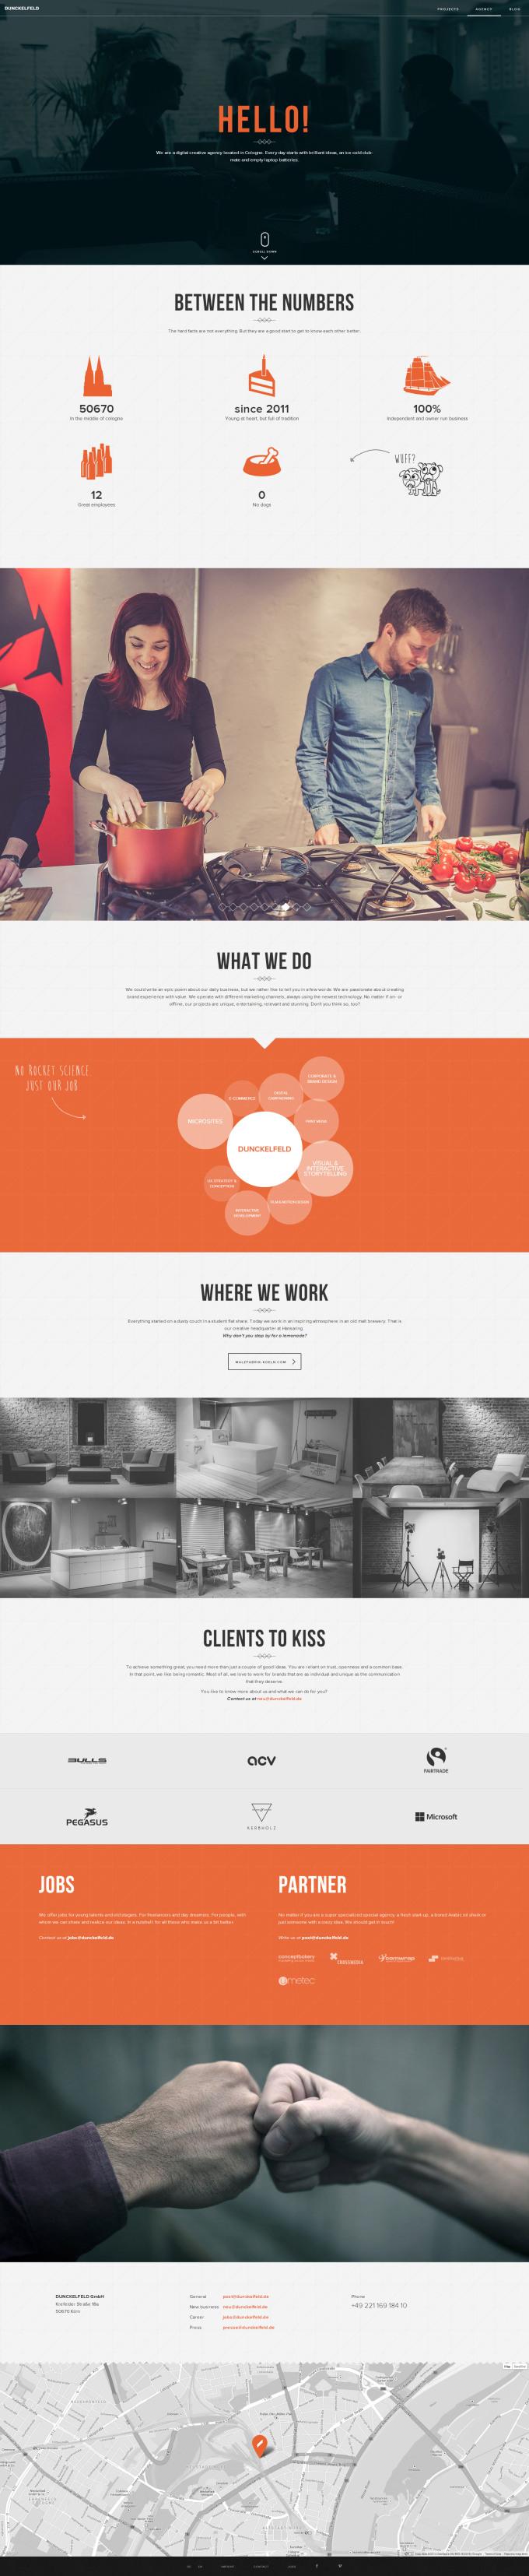 Unique Web Design, Dunckelfeld via @gosubberlin #WebDesign #Design